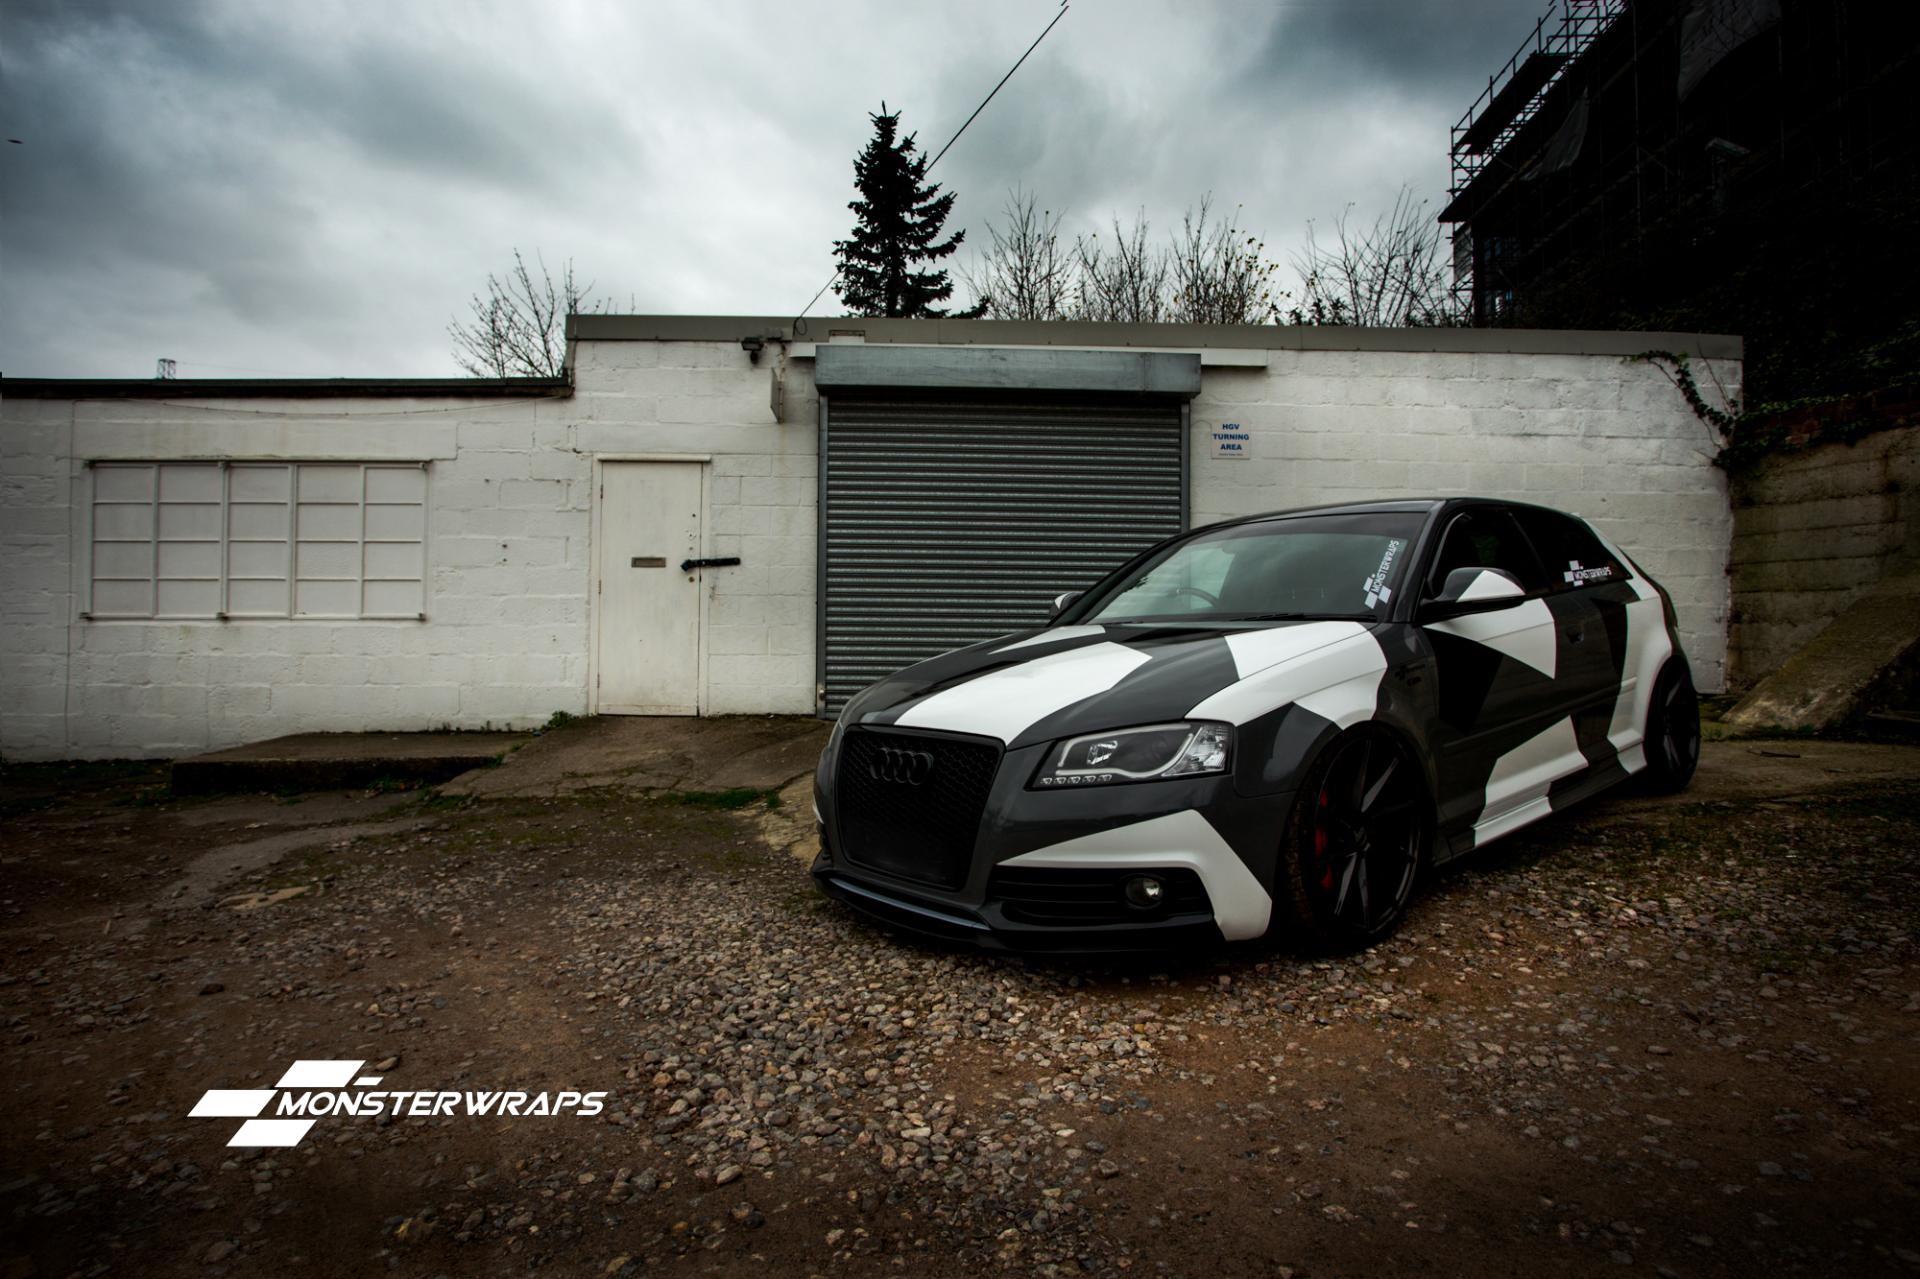 Audi A3 Stealth Grey Camo Wrap